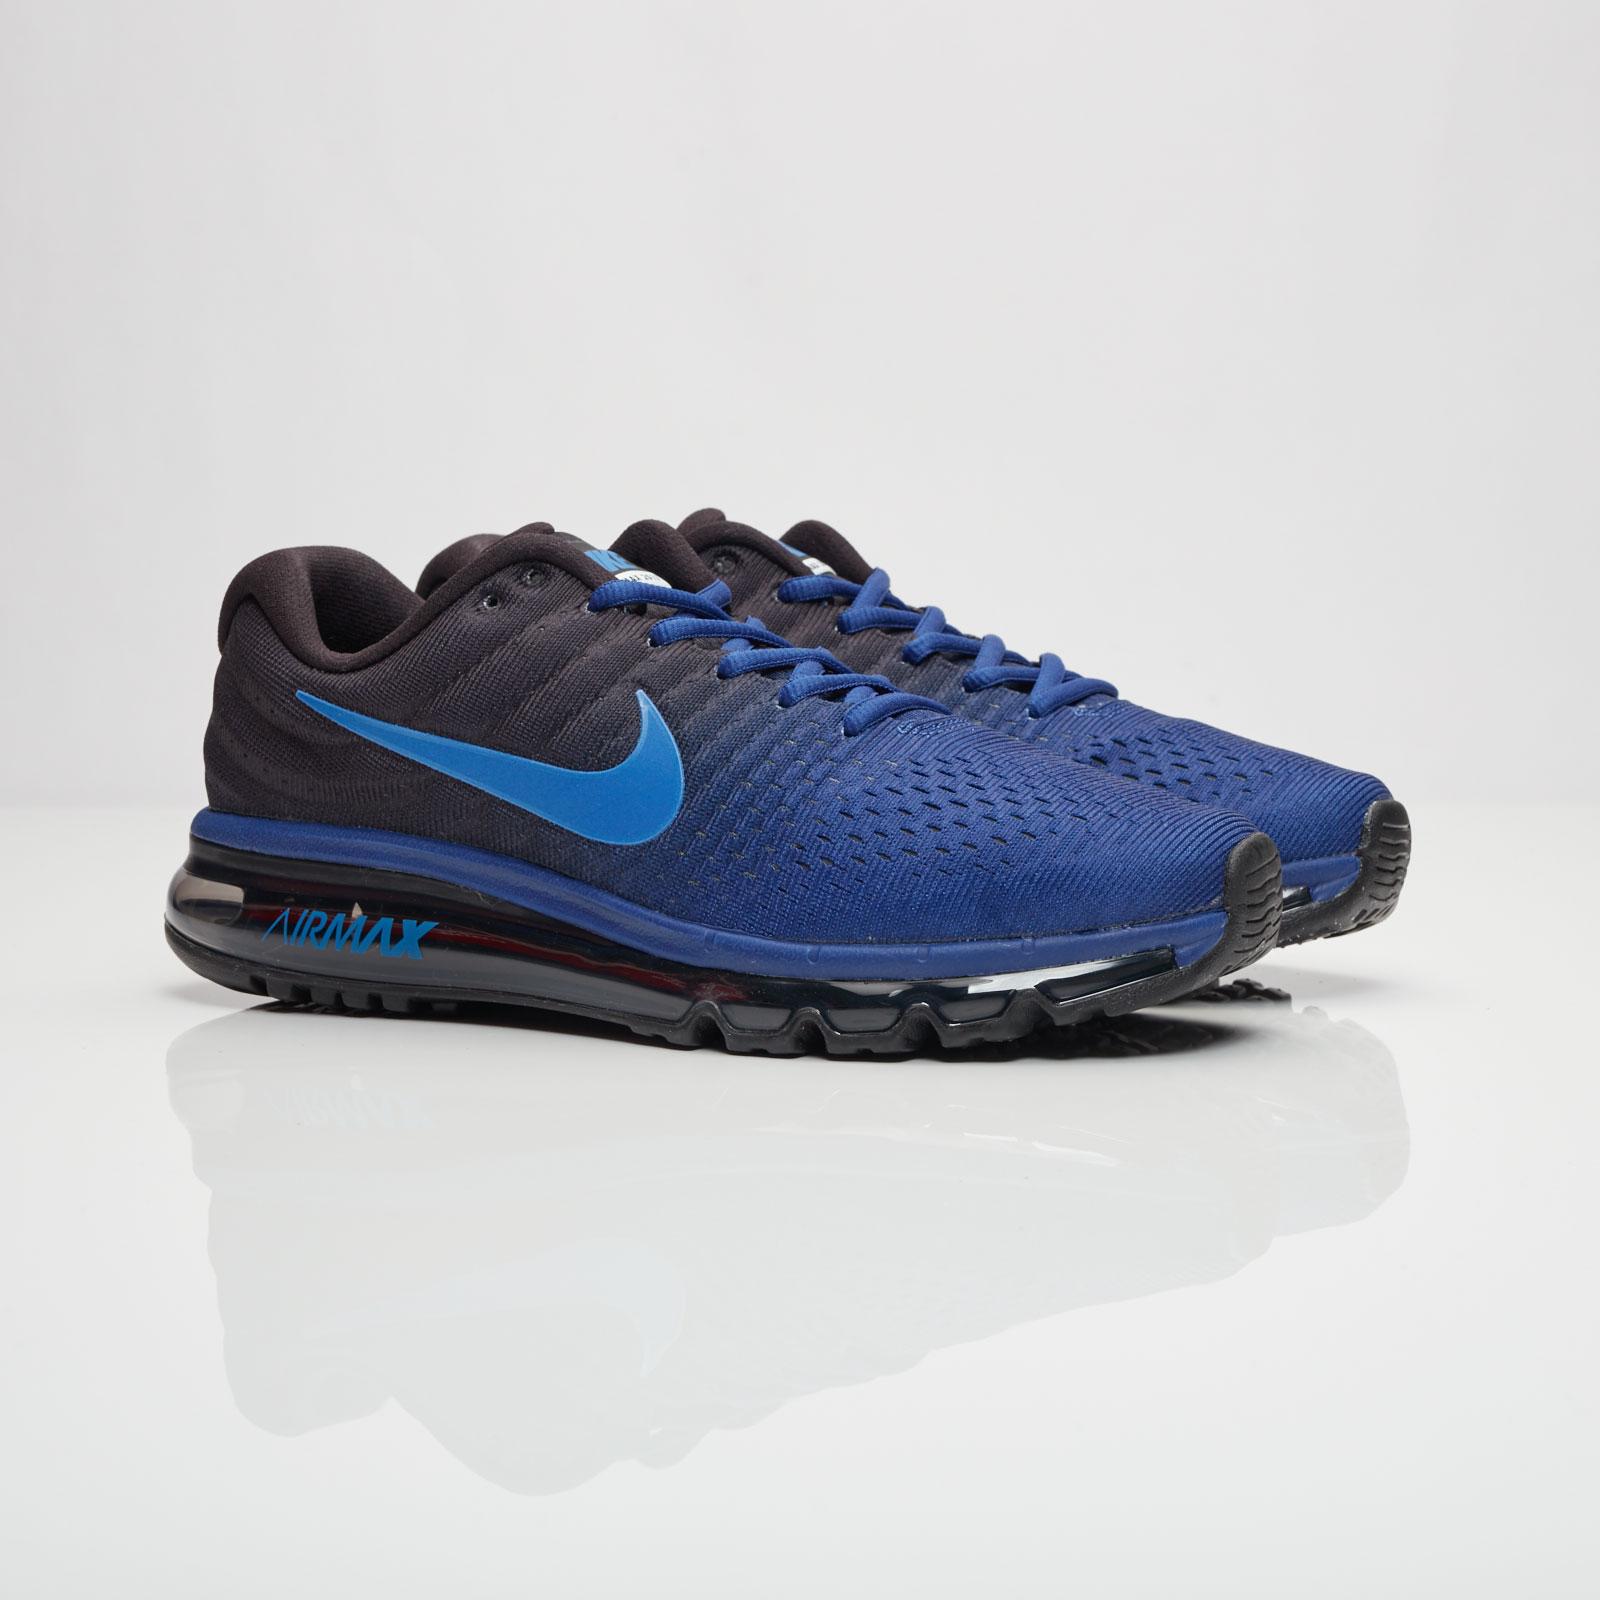 Nike Air Max 2017 - 849559-401 - Sneakersnstuff  579050f492